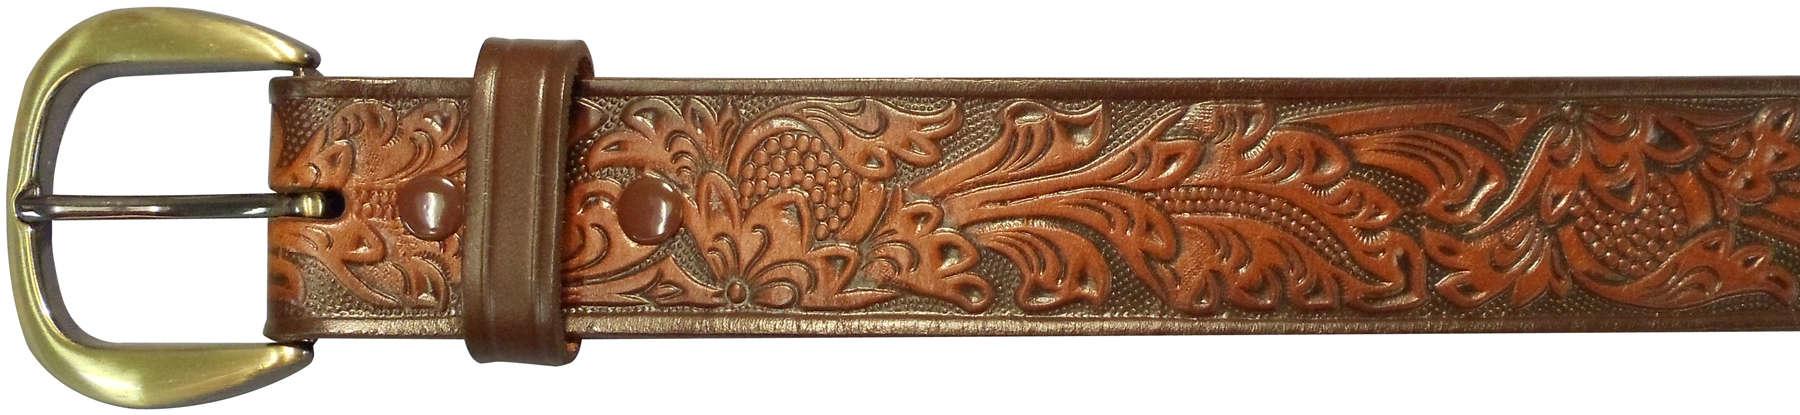 "10610110238 - 38"" Brown Leather Embossed Belt"